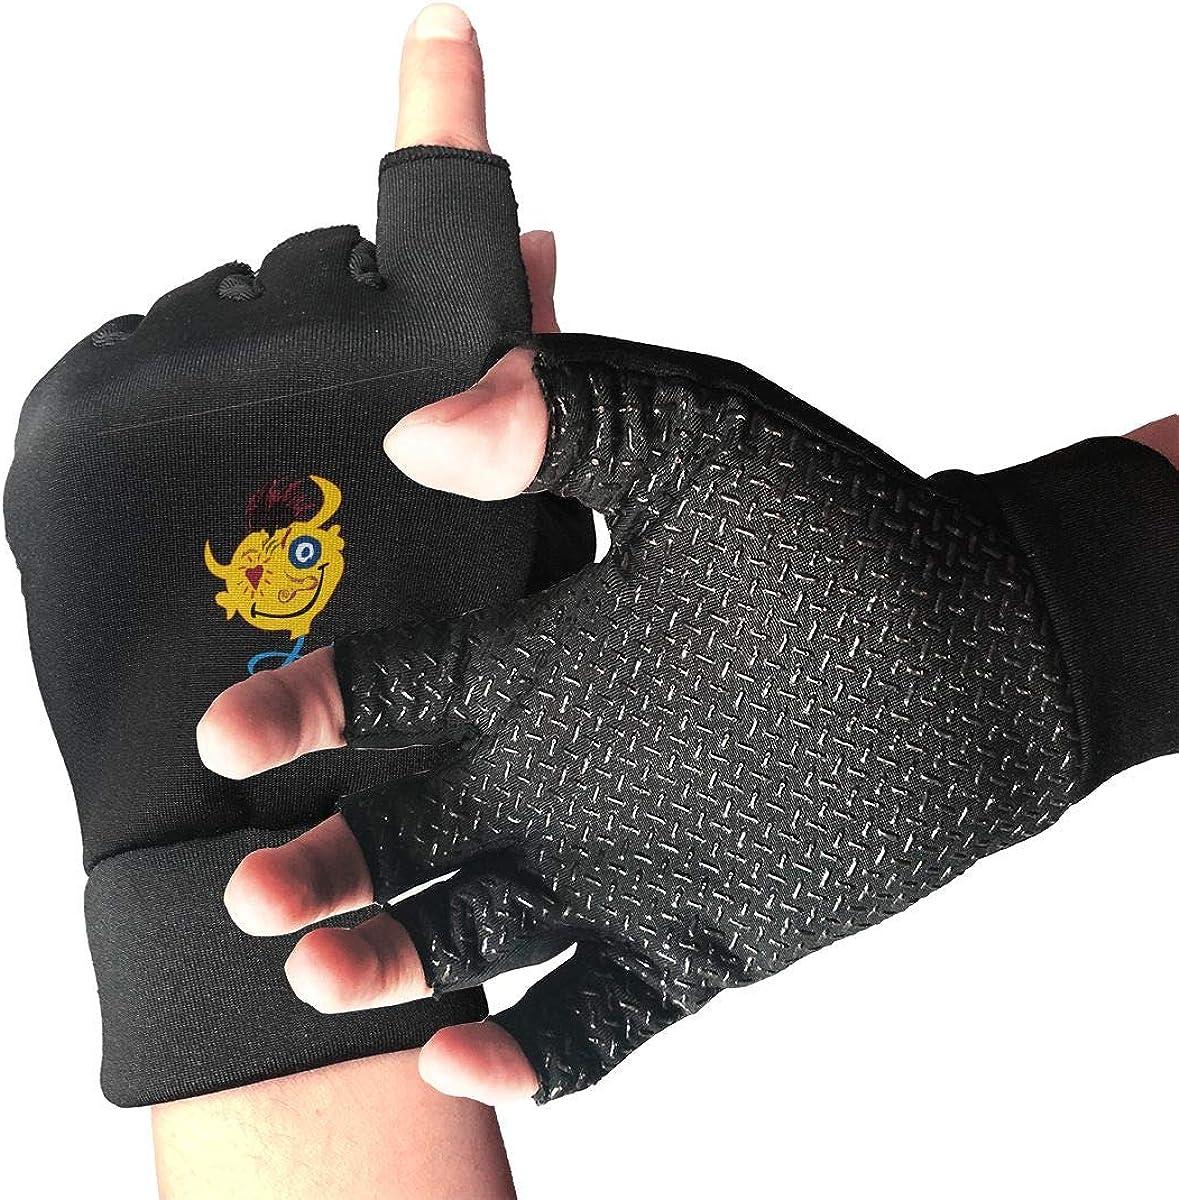 Gloves DevilBoy Fingerless Gloves Short Touchscreen Gloves Winter Motorcycle Biker Mitten